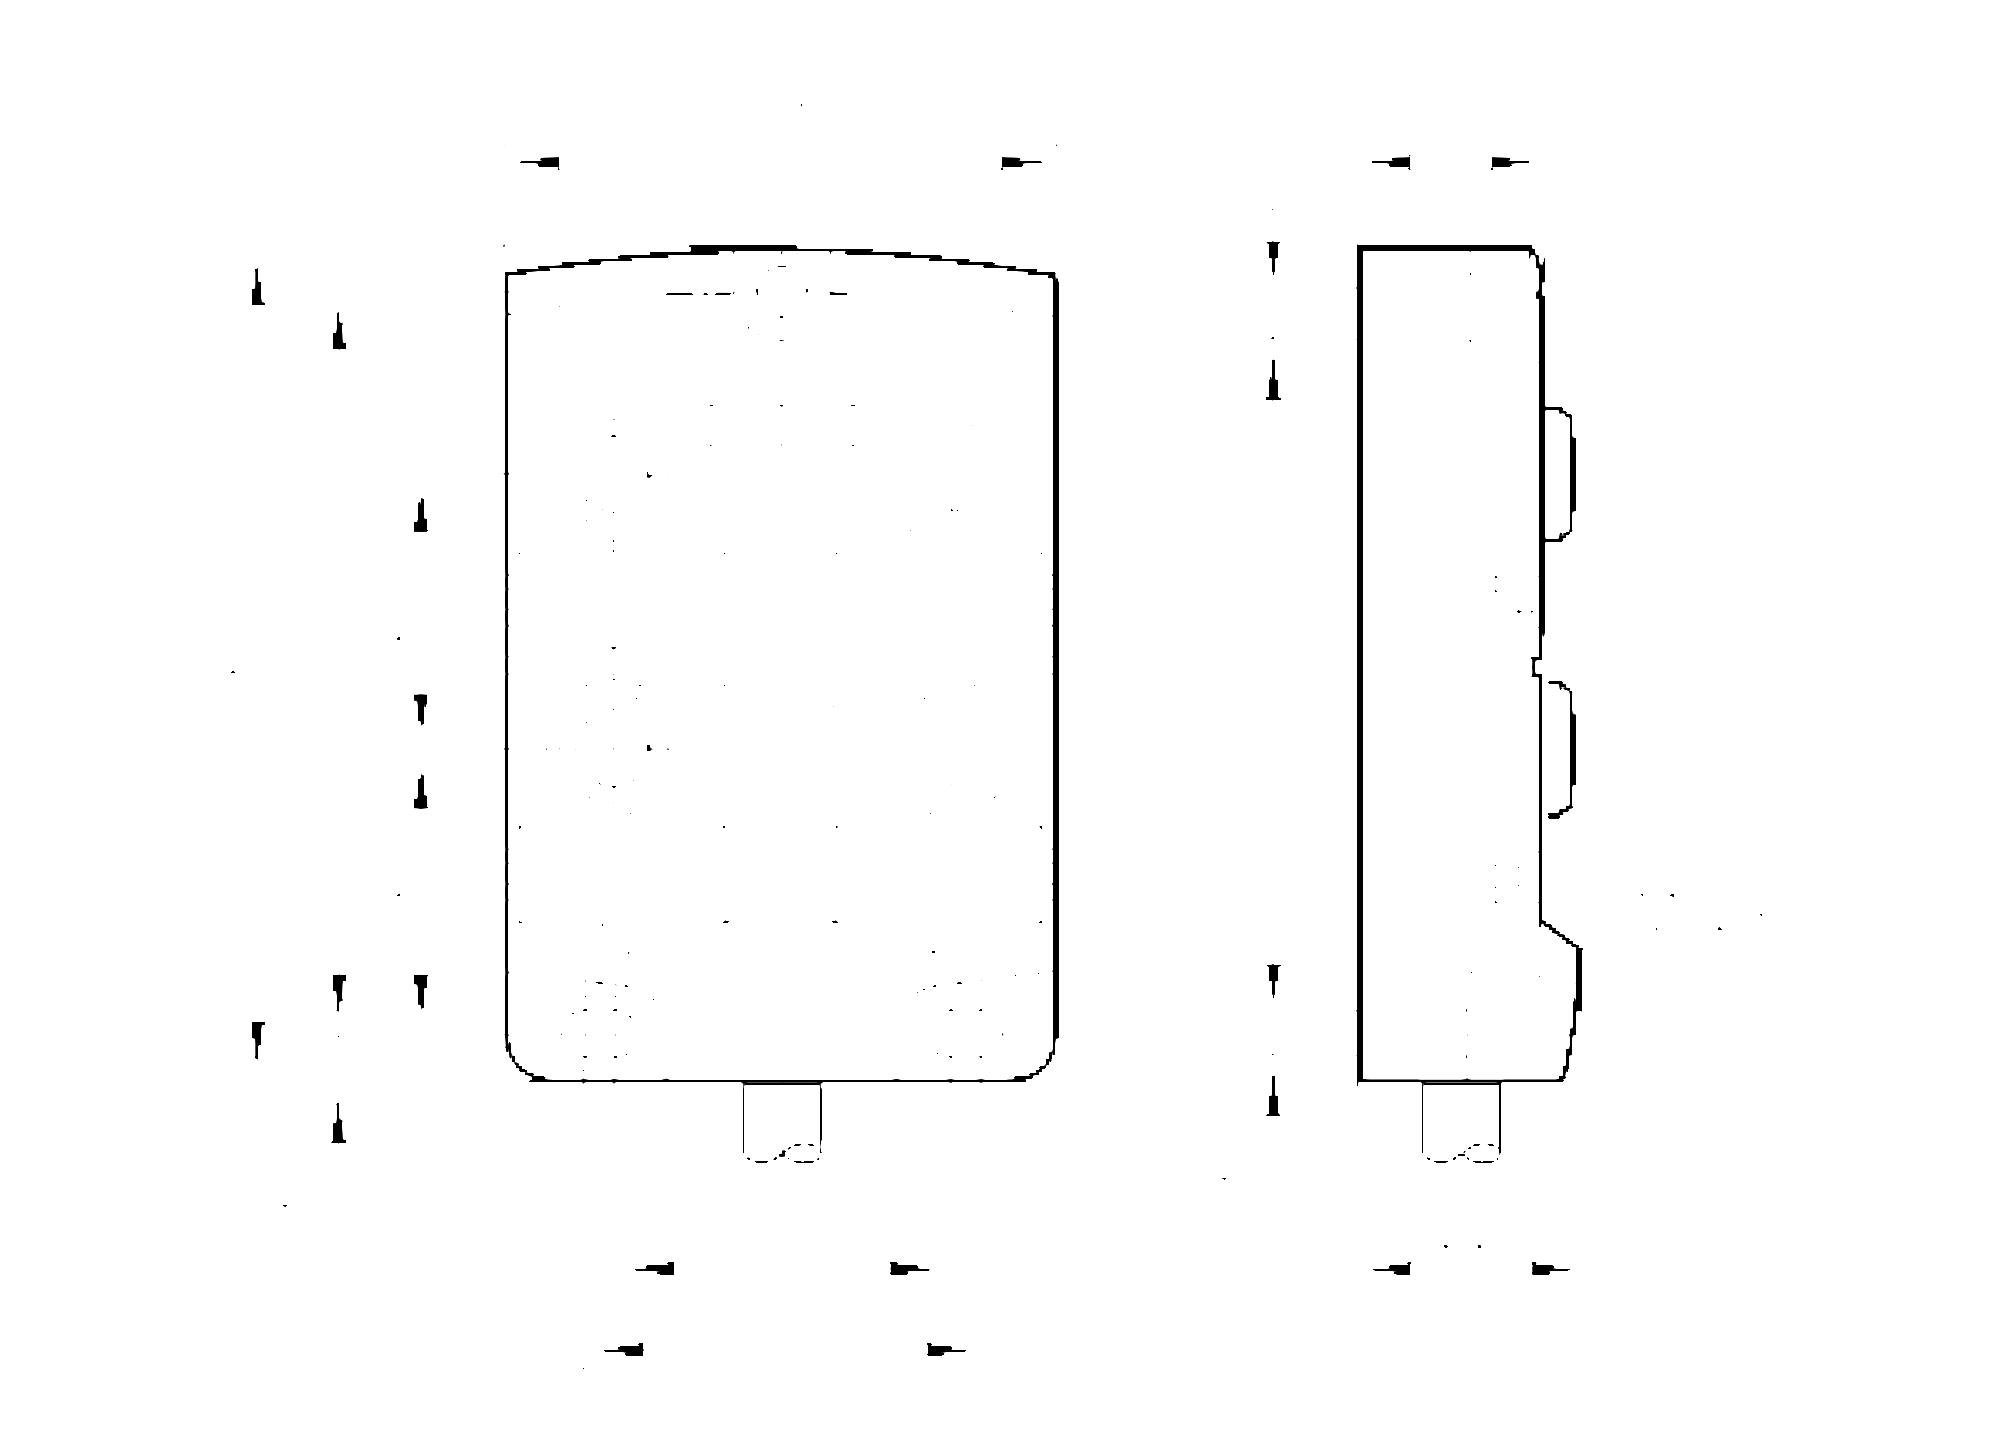 ebc015 - splitter box